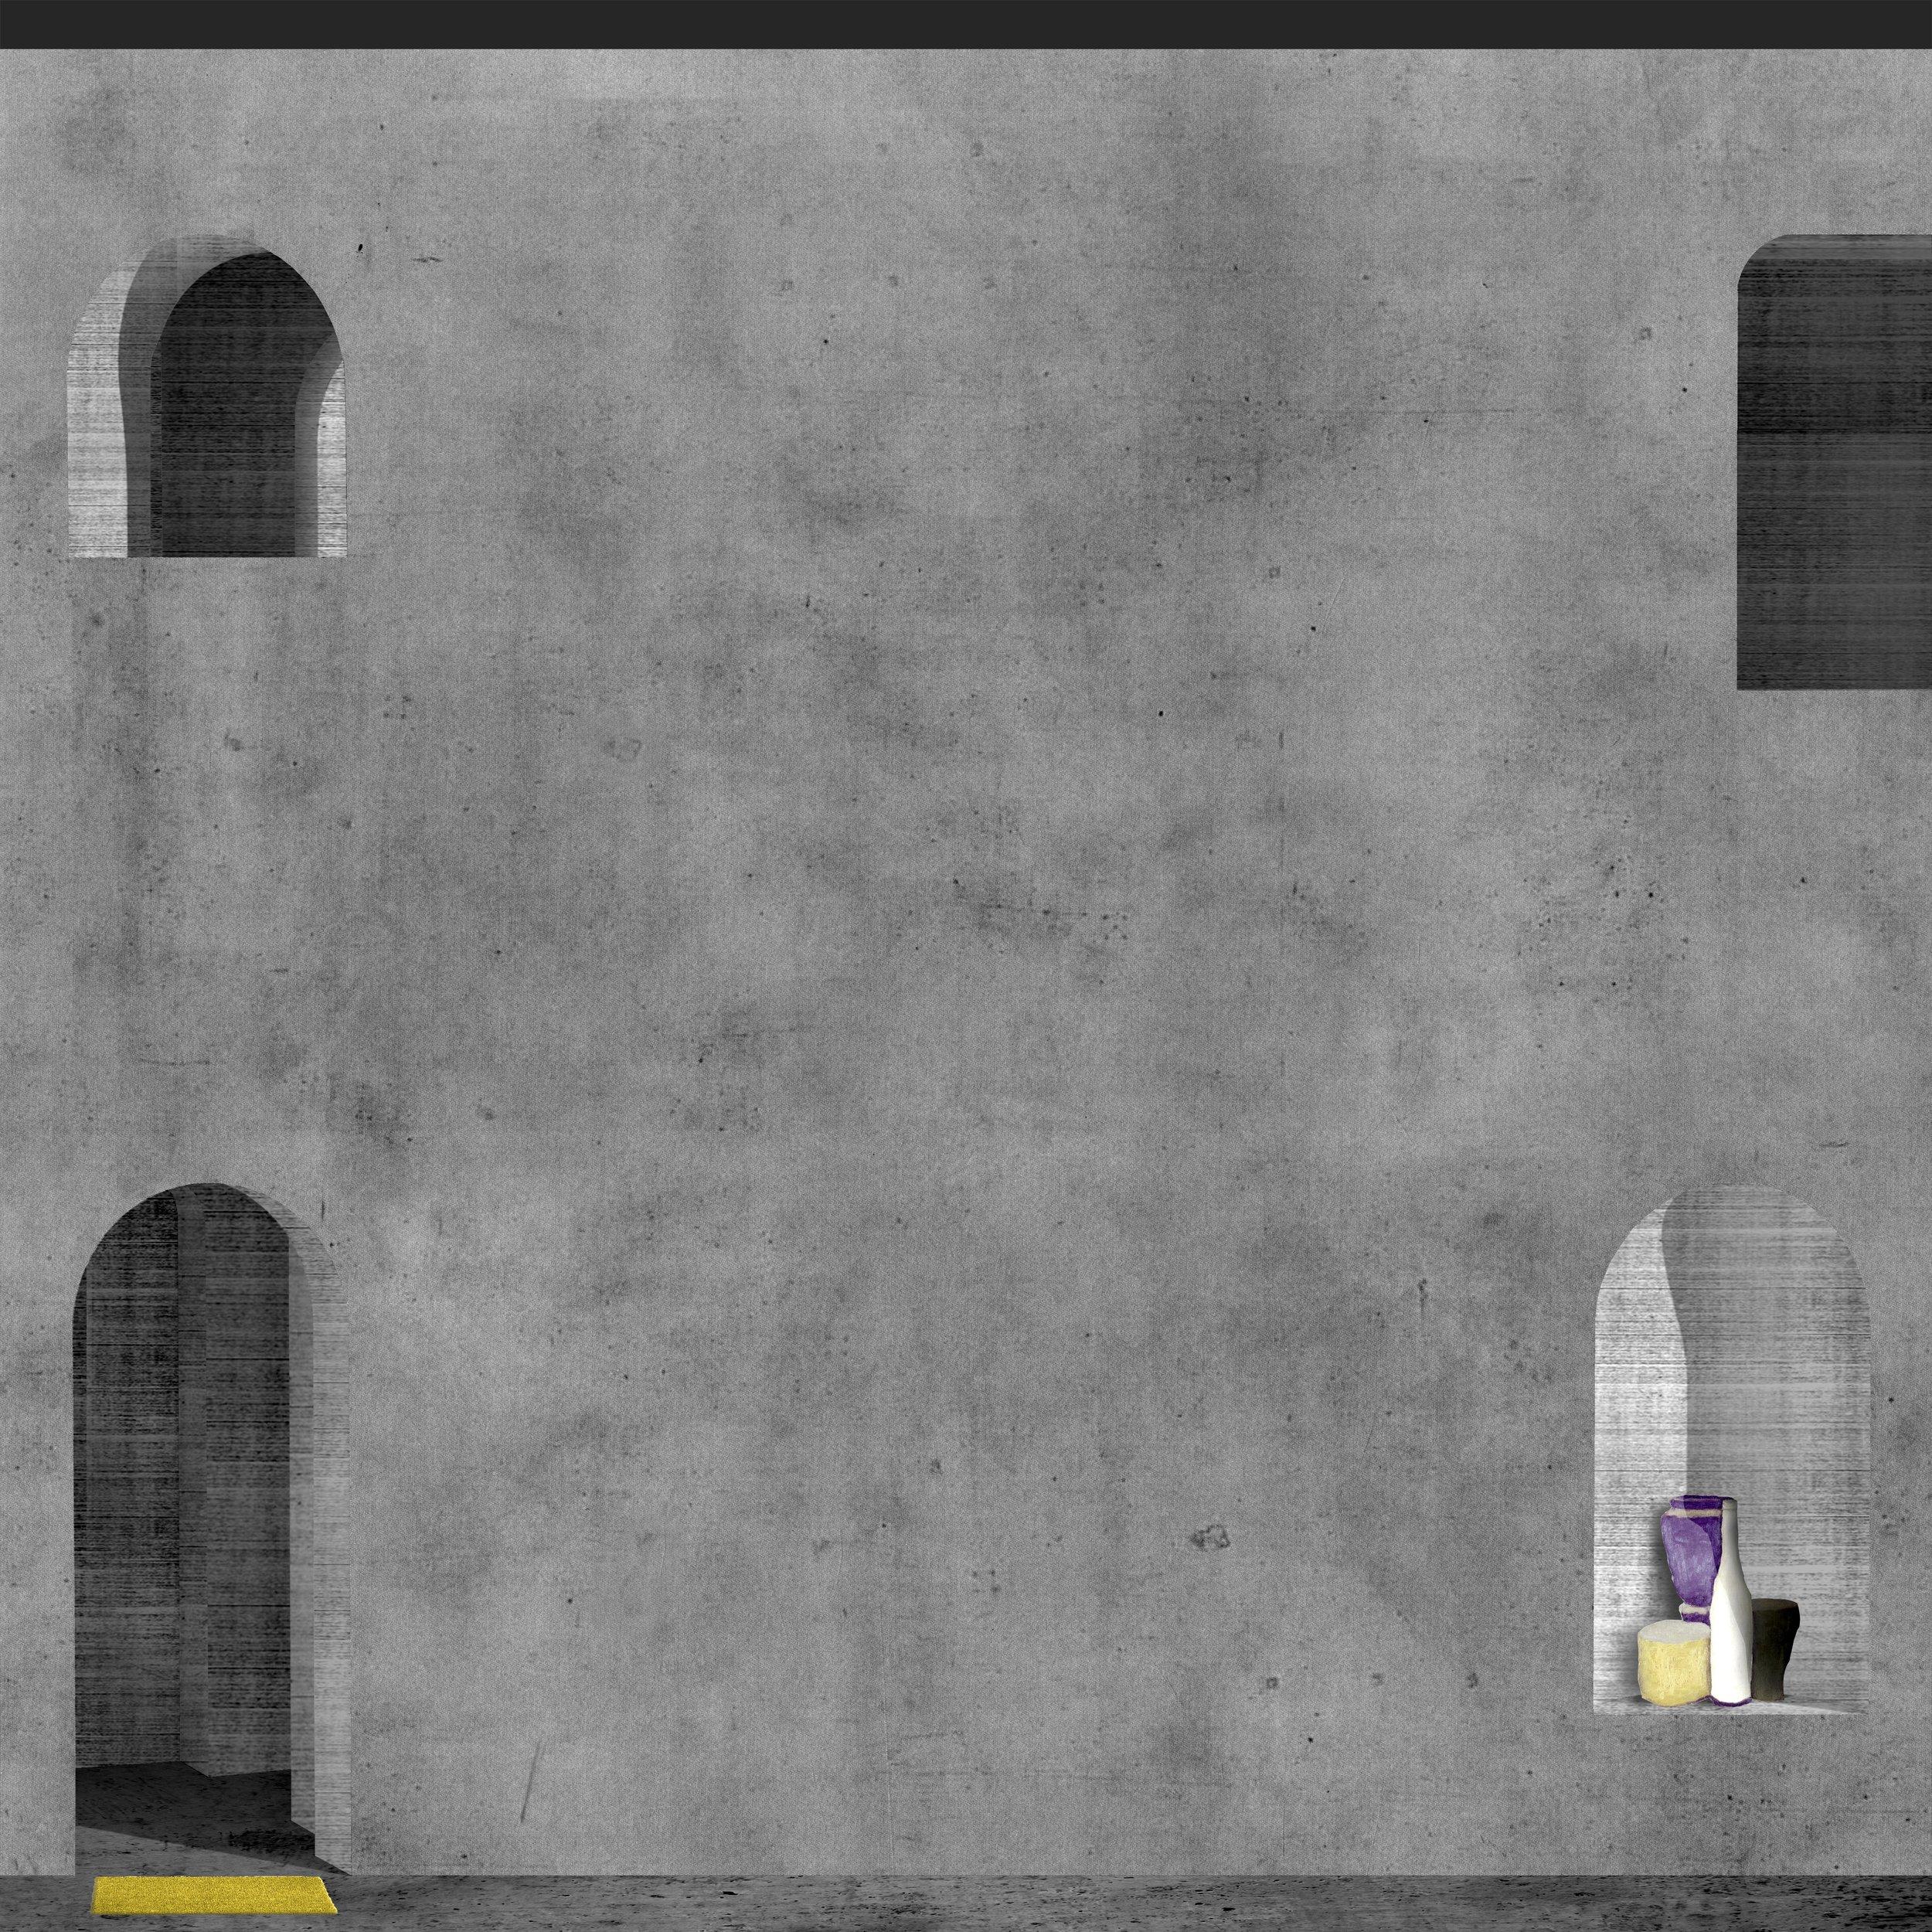 WALL-HOUSE_wall.jpg